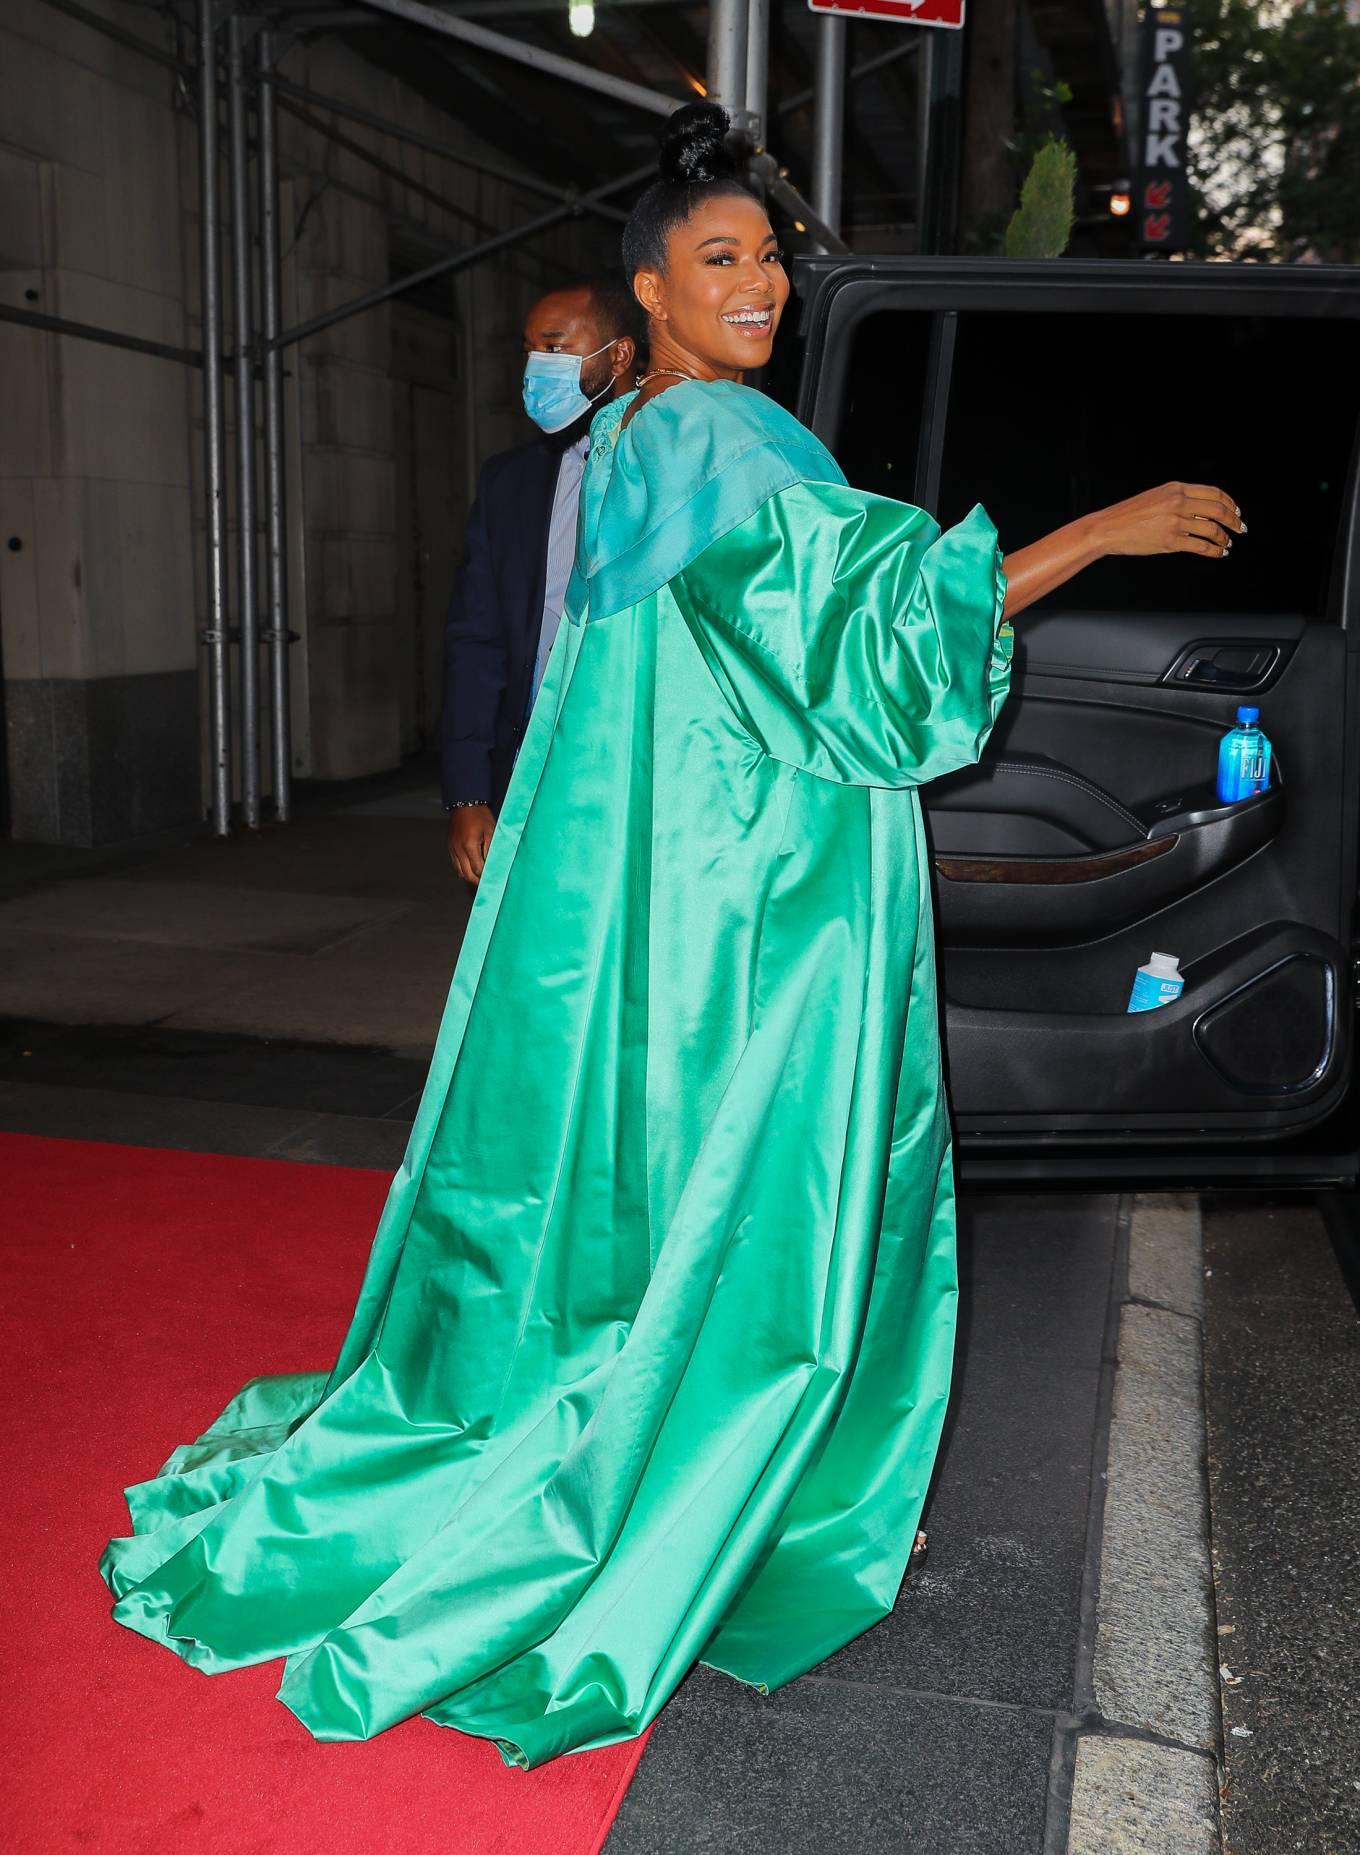 Gabrielle Union 2021 : Gabrielle Union – Seen in a green dress in New York-01